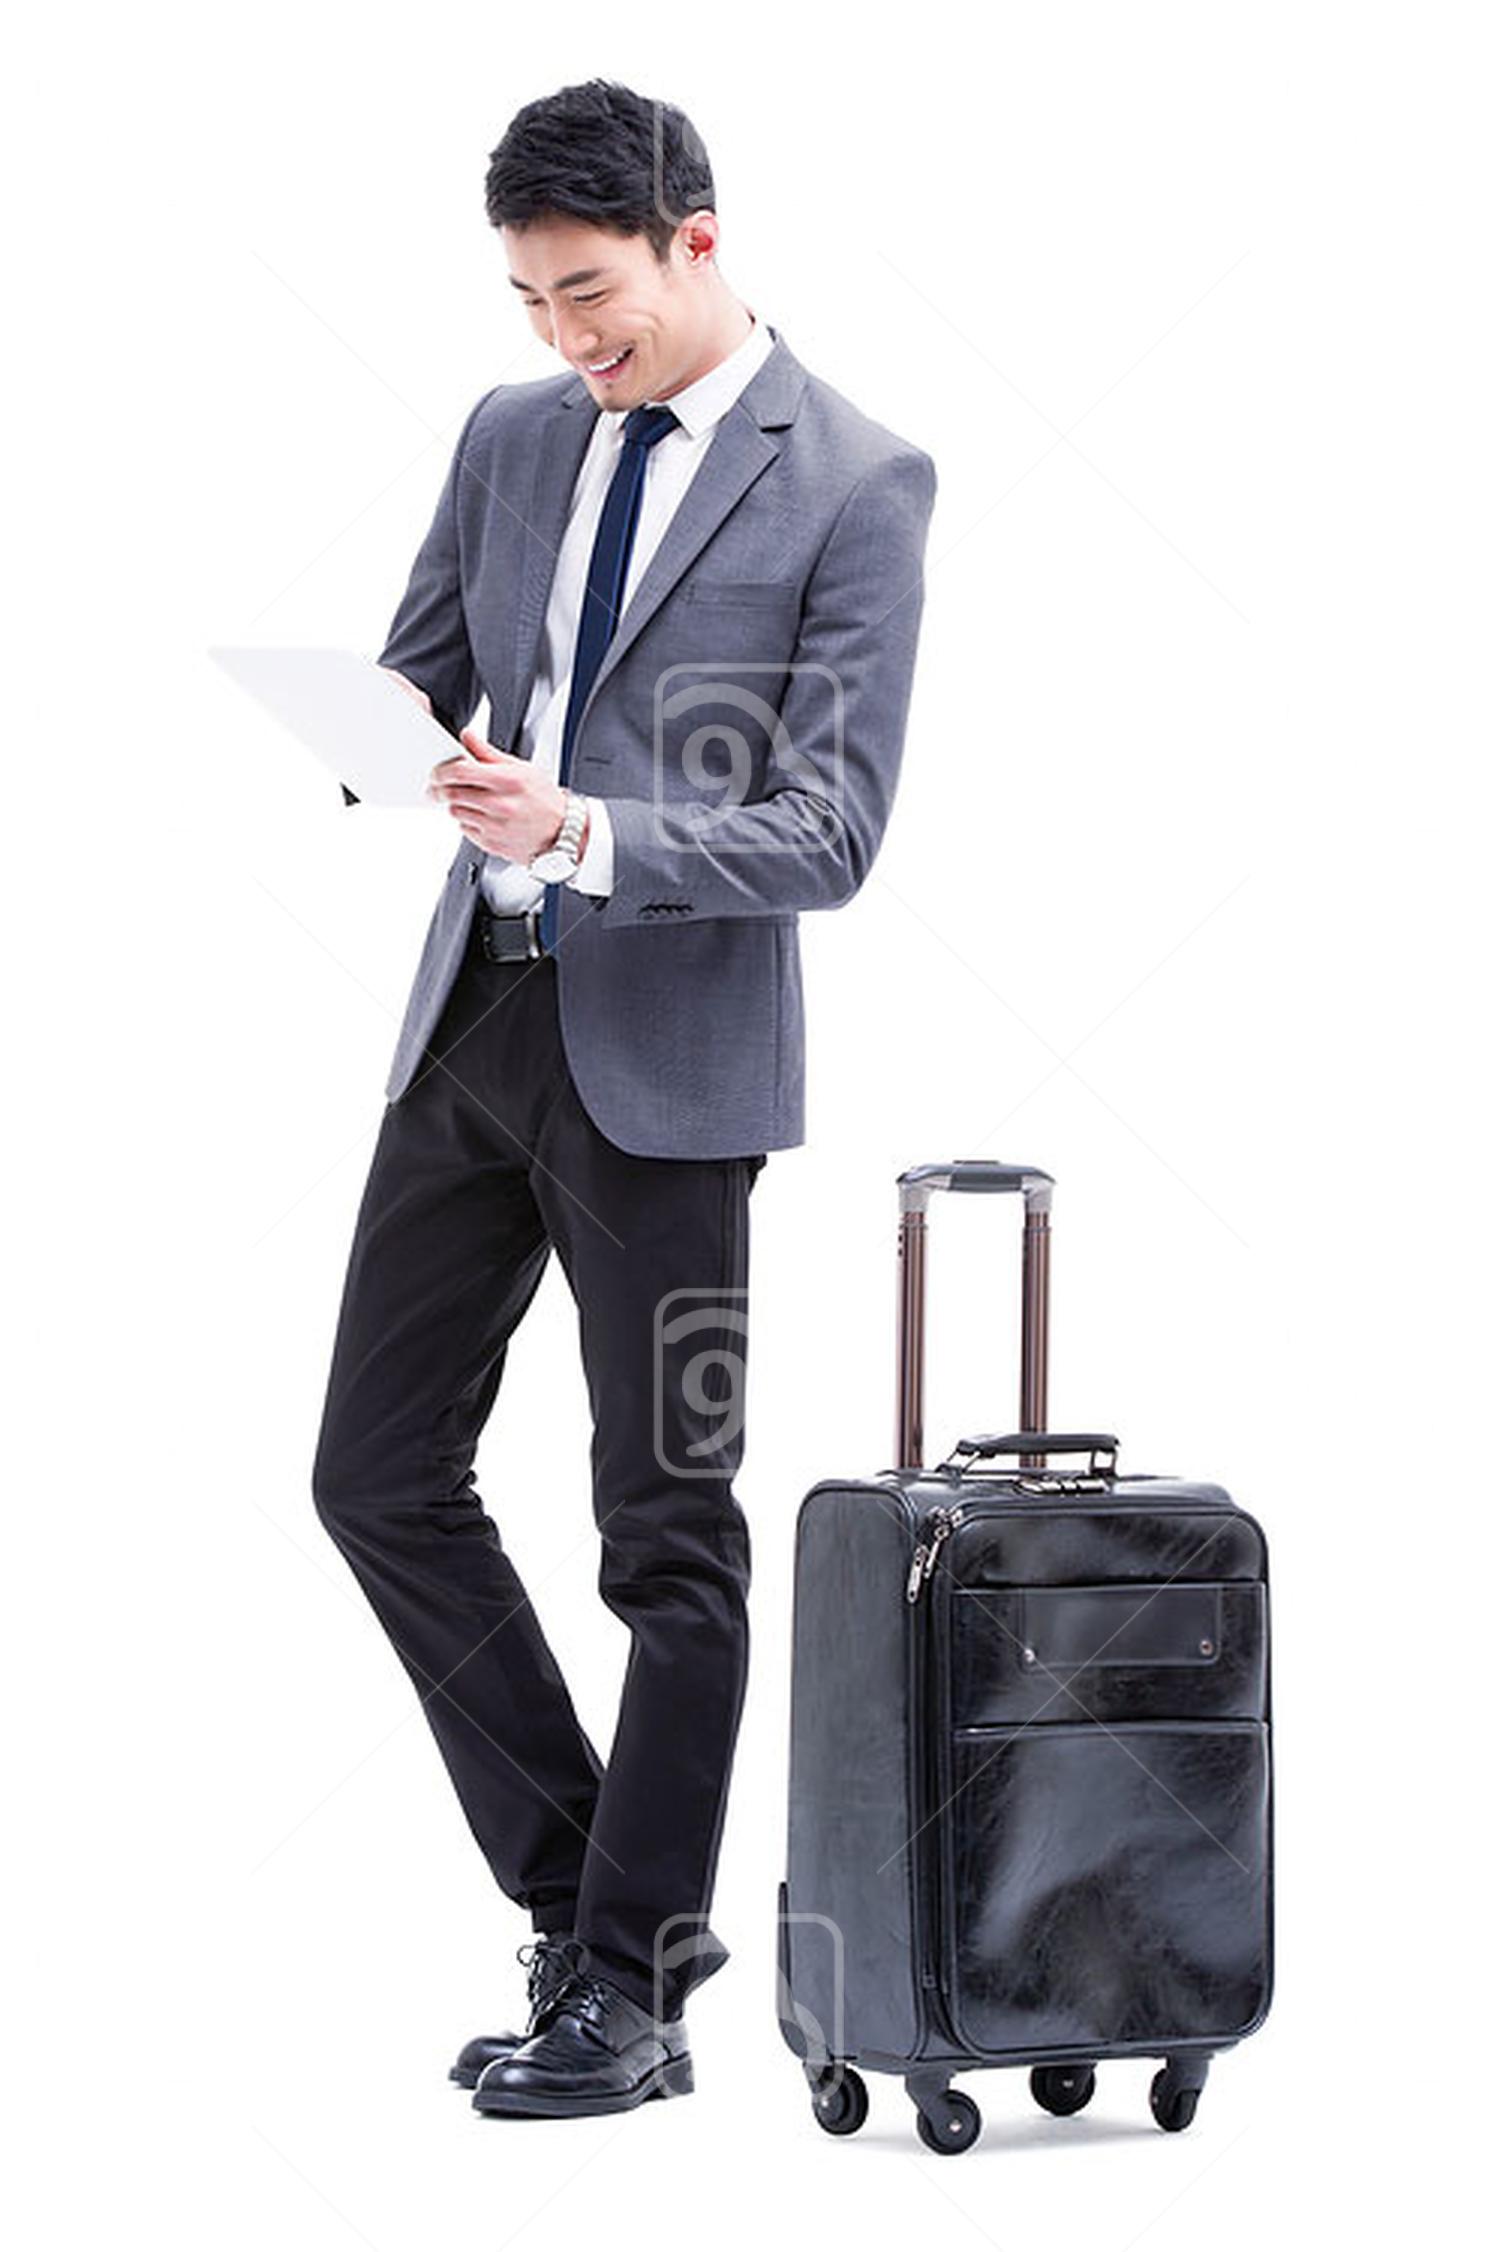 Fashionable Chinese businessman using digital tablet